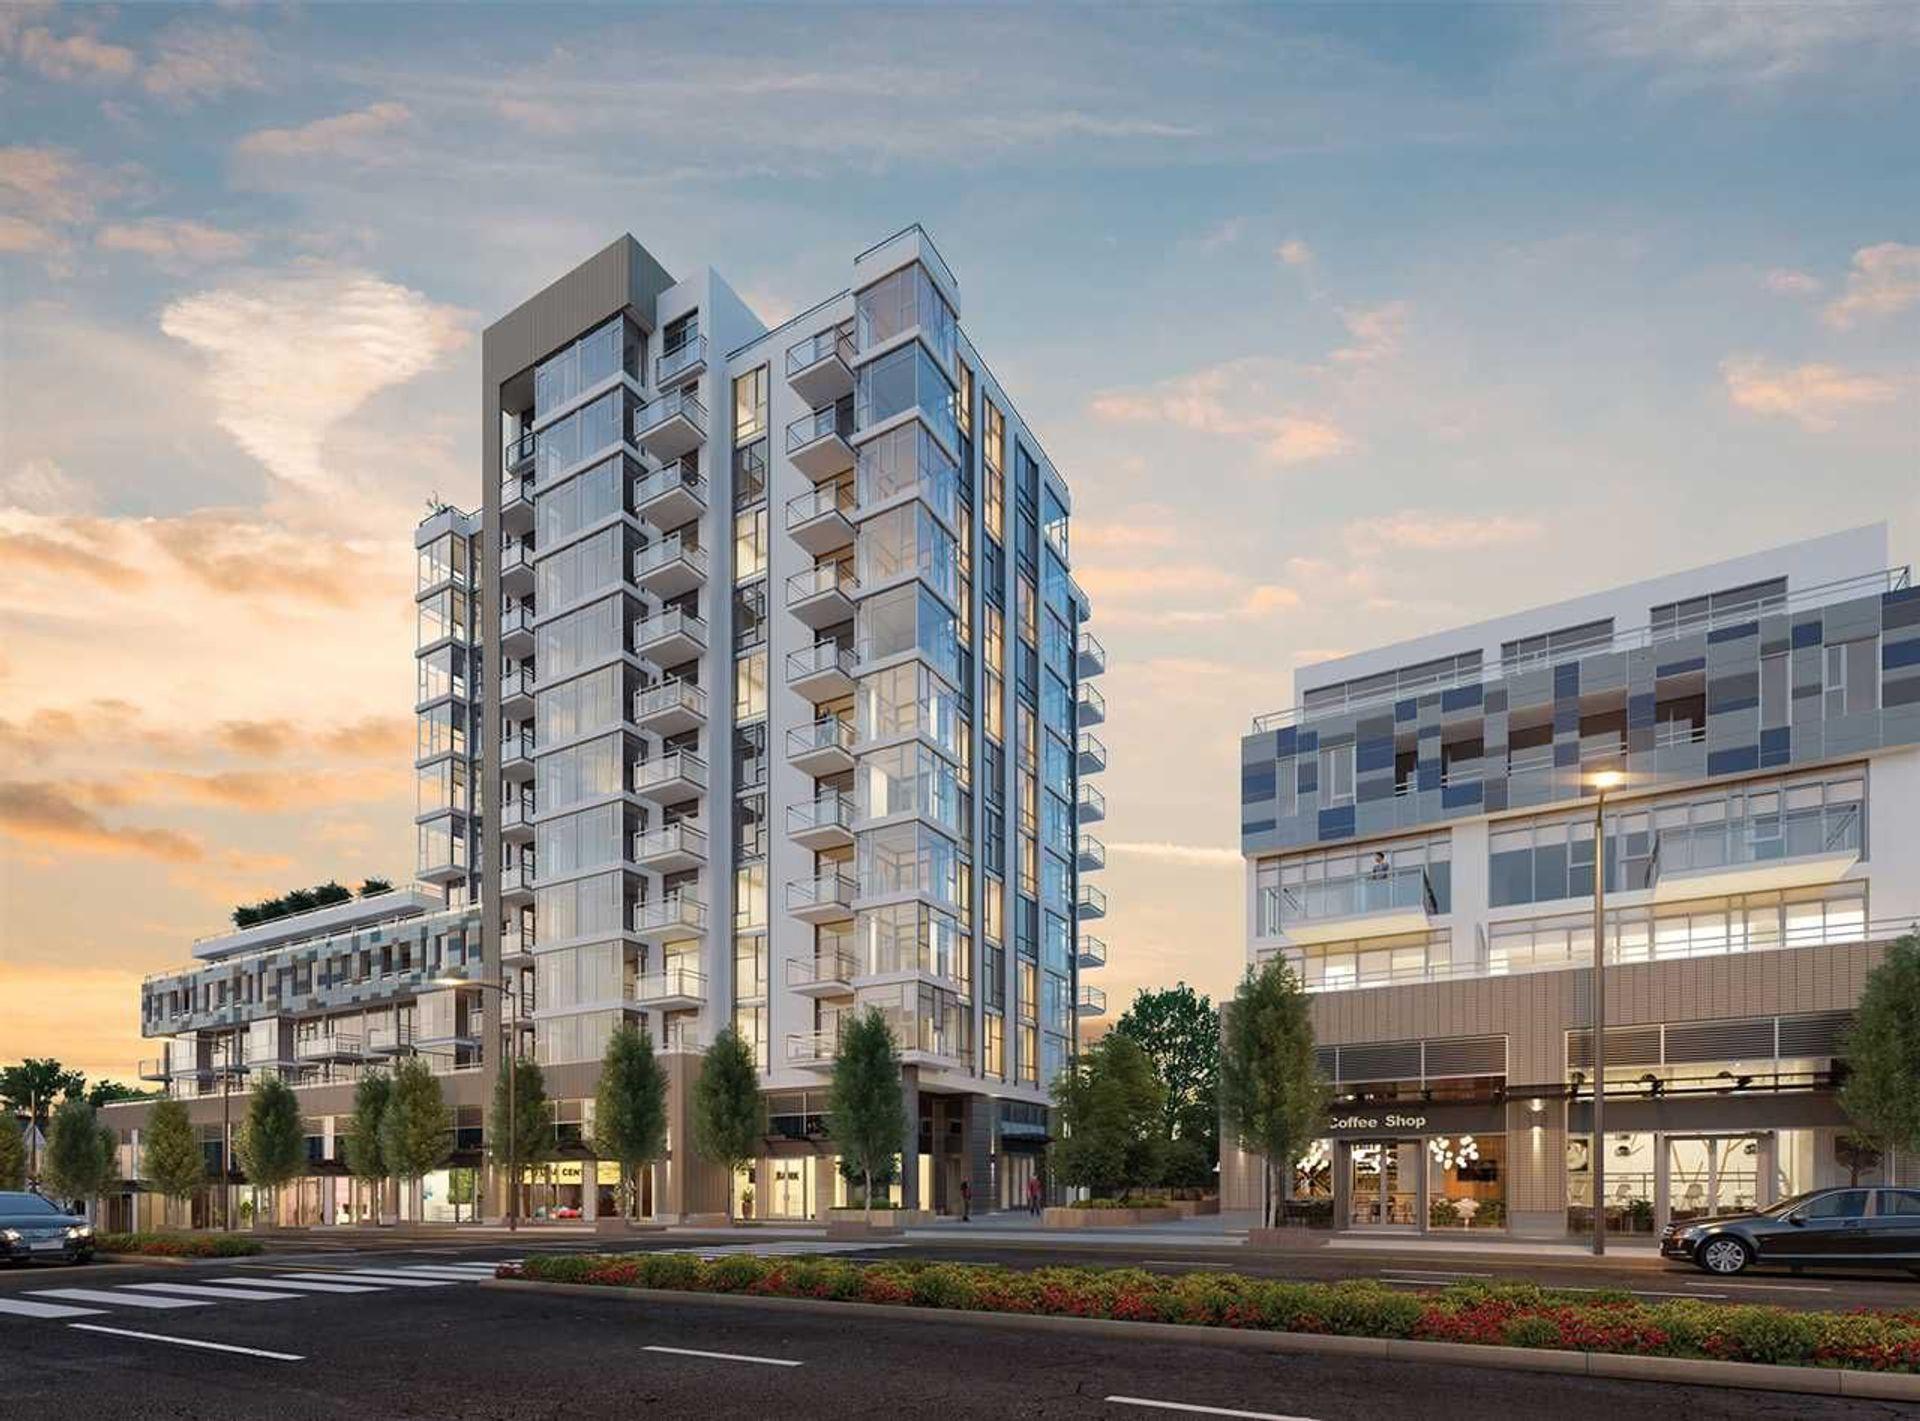 2435-kingsway-collingwood-ve-vancouver-east-01 at 1205 - 2435 Kingsway, Collingwood VE, Vancouver East